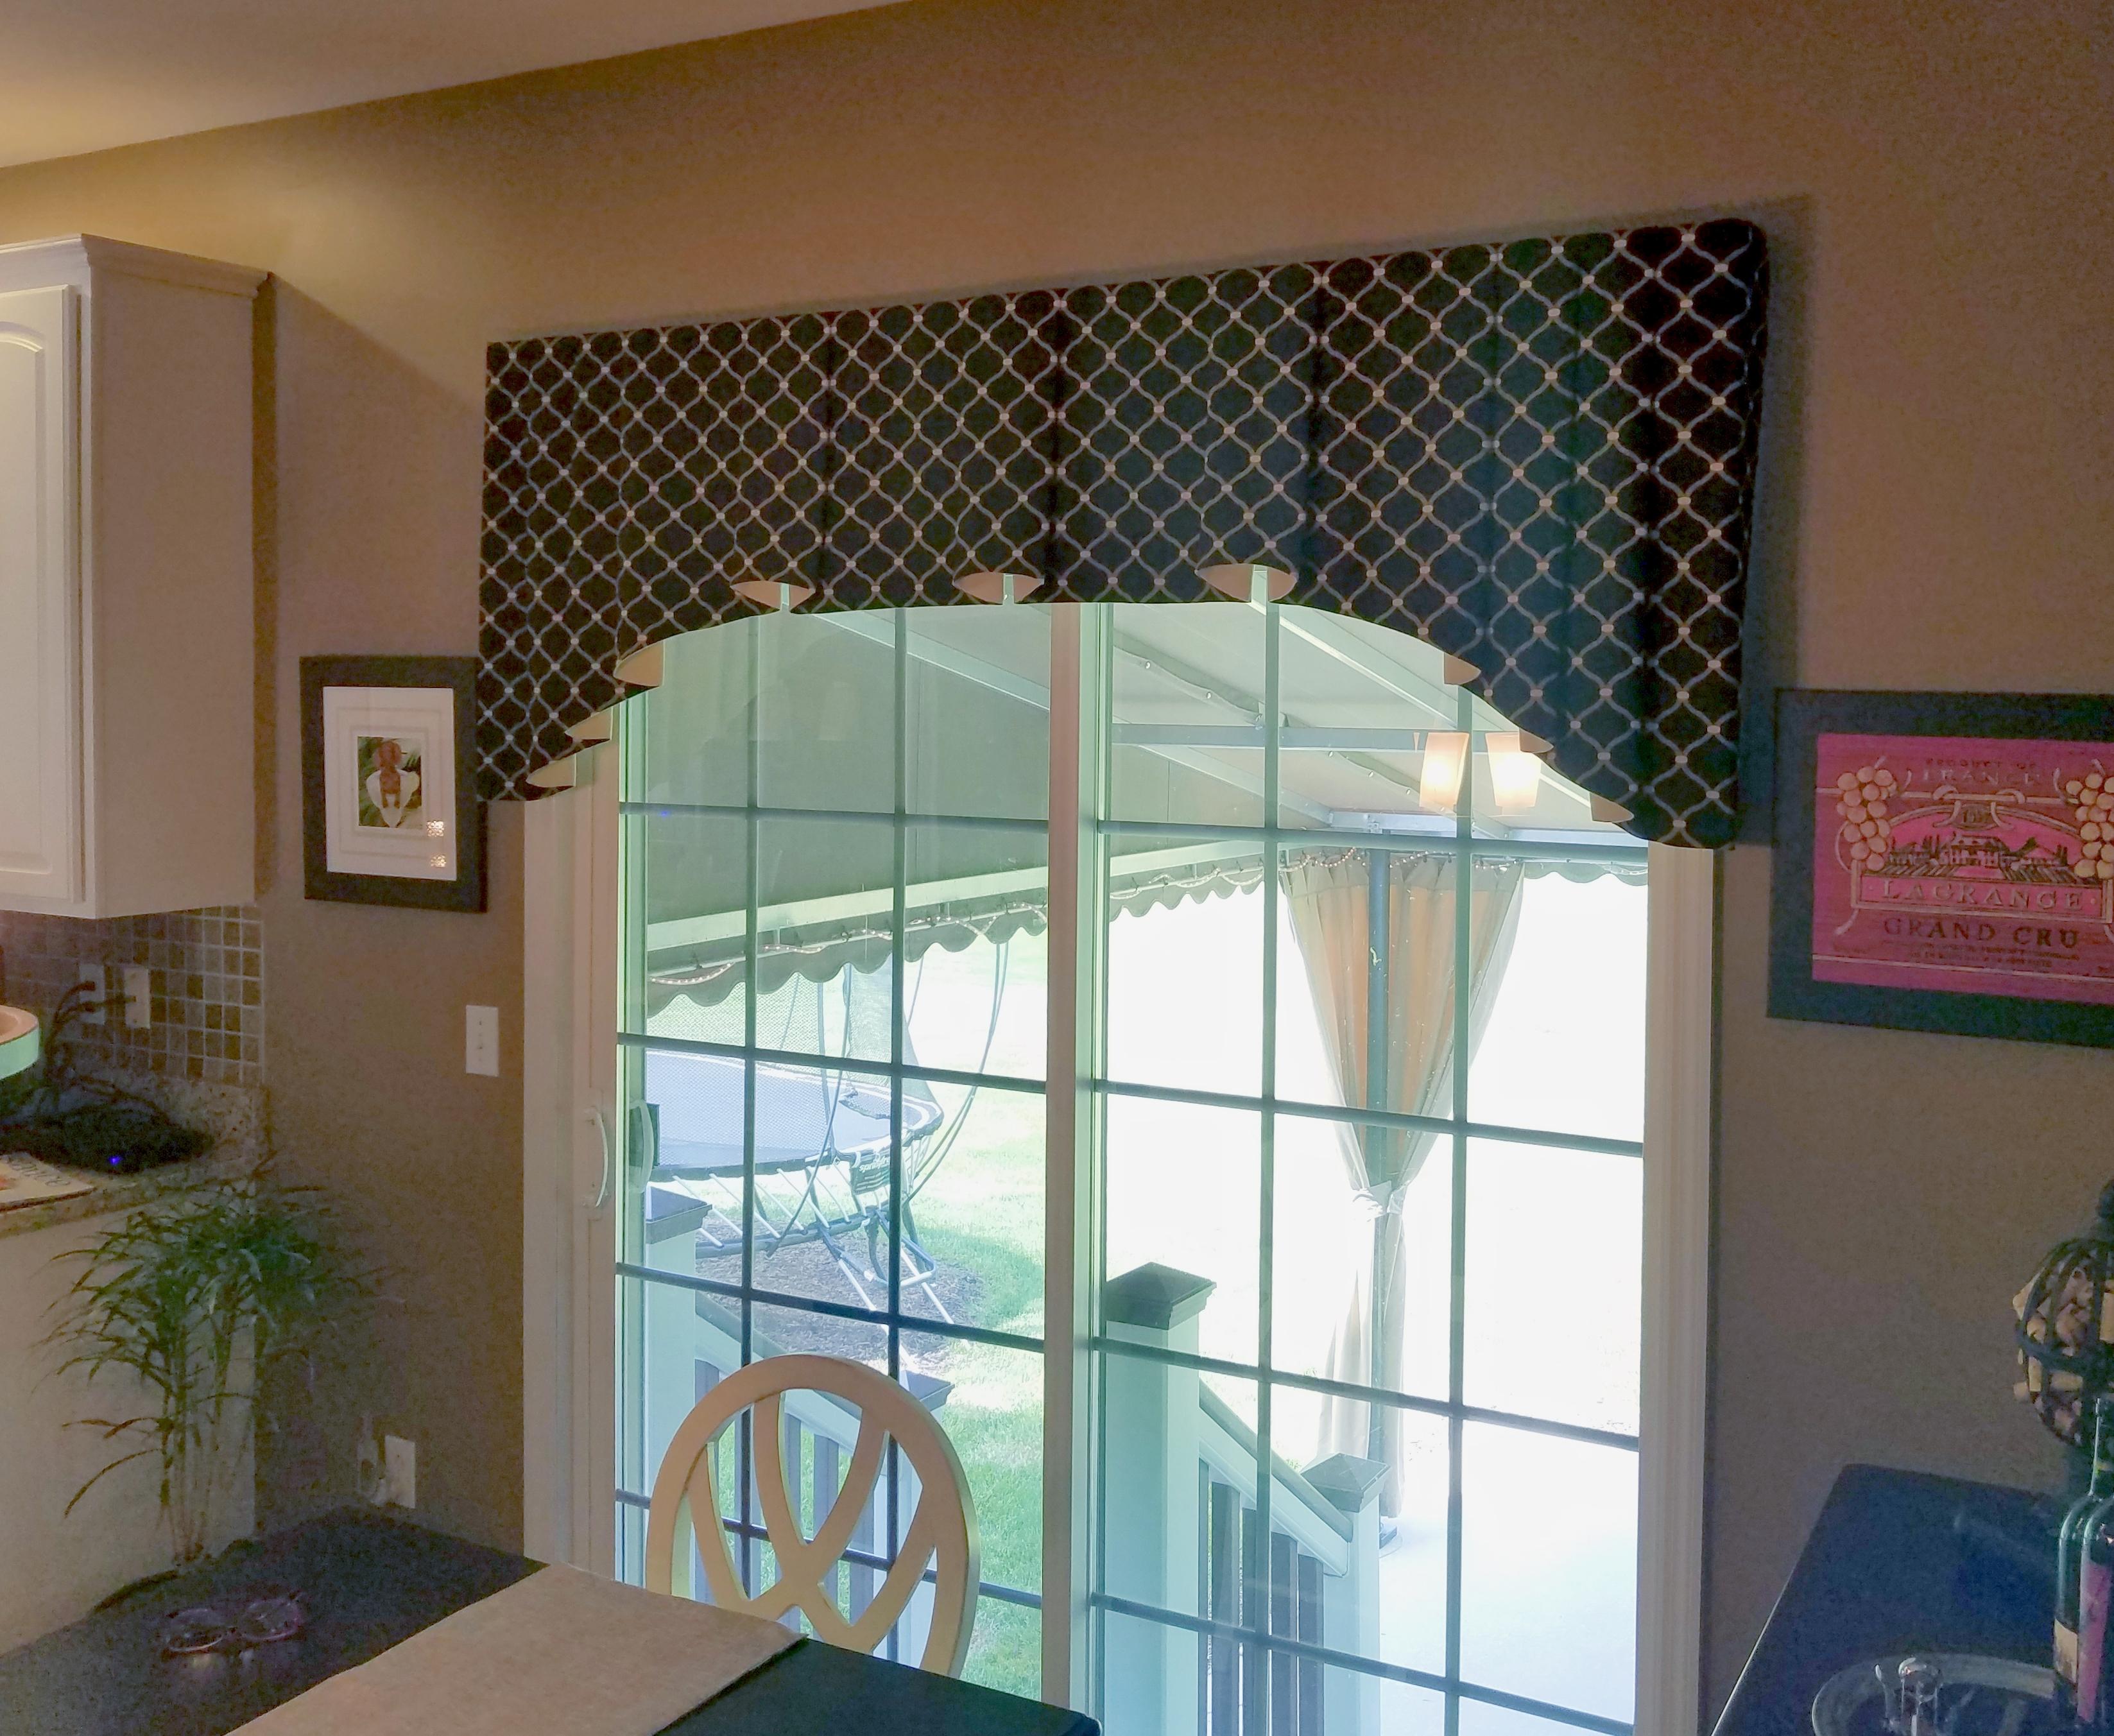 Valance Over Sliding Glass Doors3294 X 2705